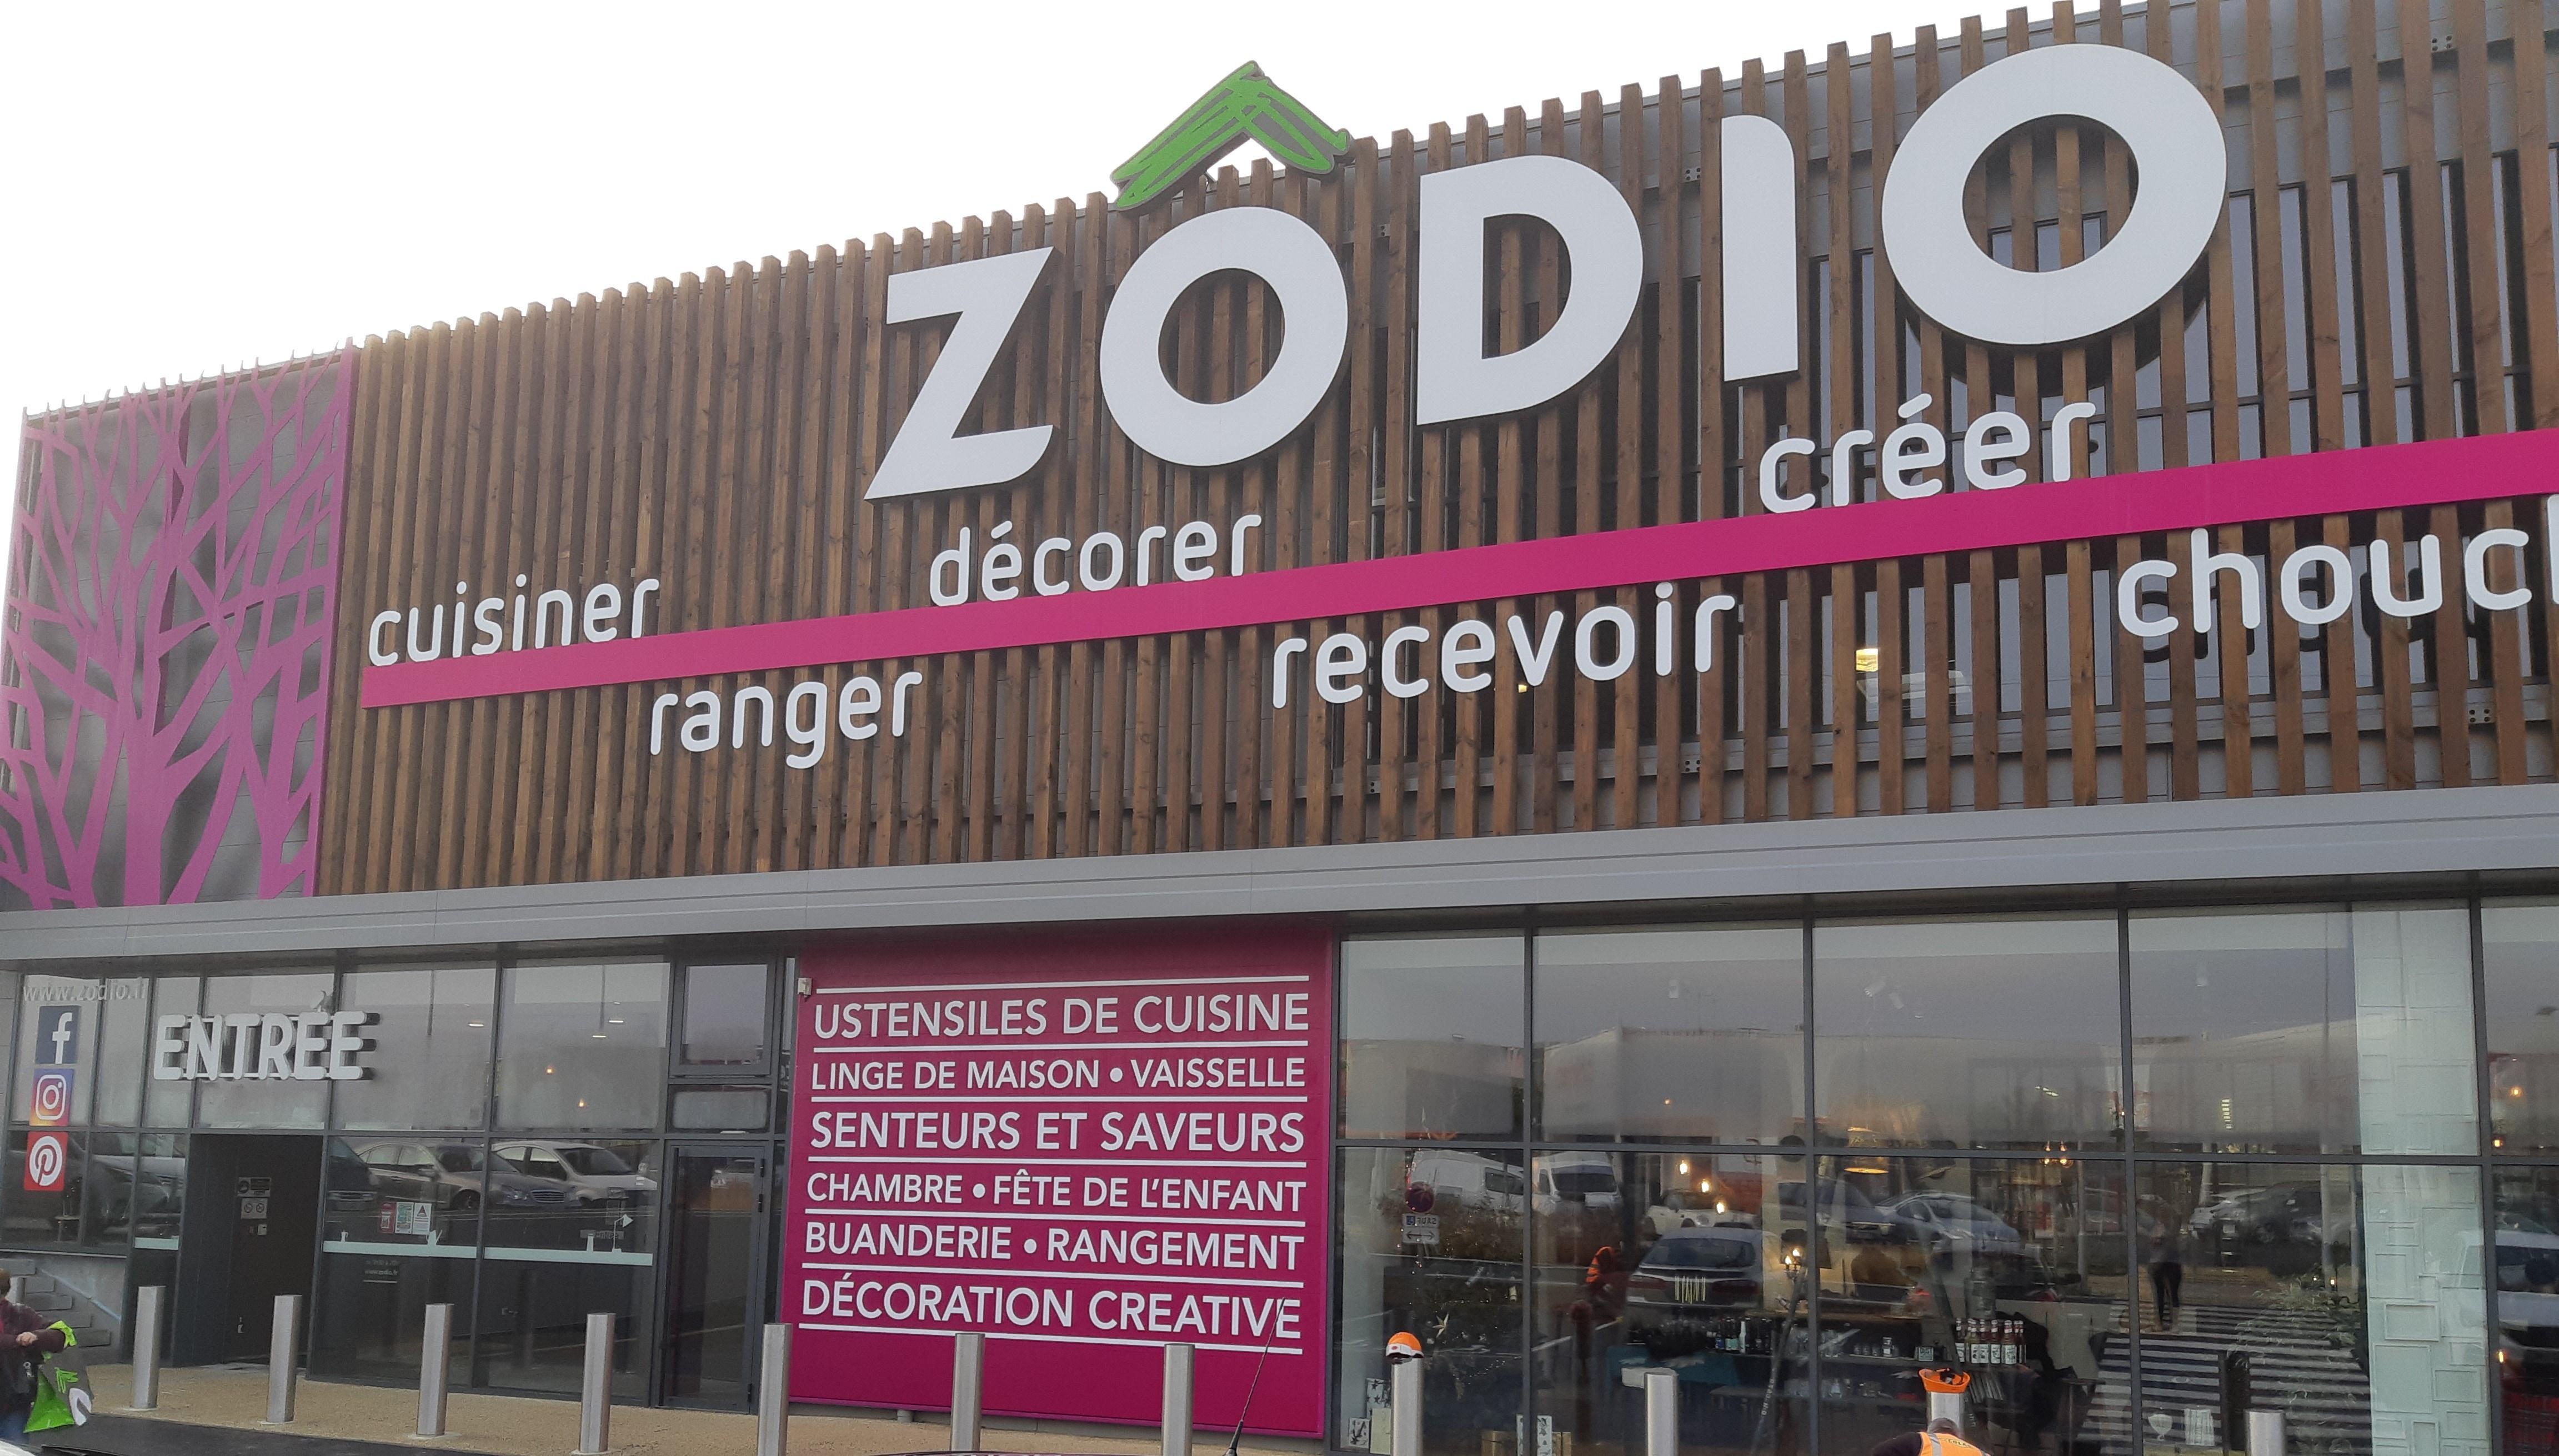 Magasin Deco La Rochelle Zodio Horaires Adresse Contact